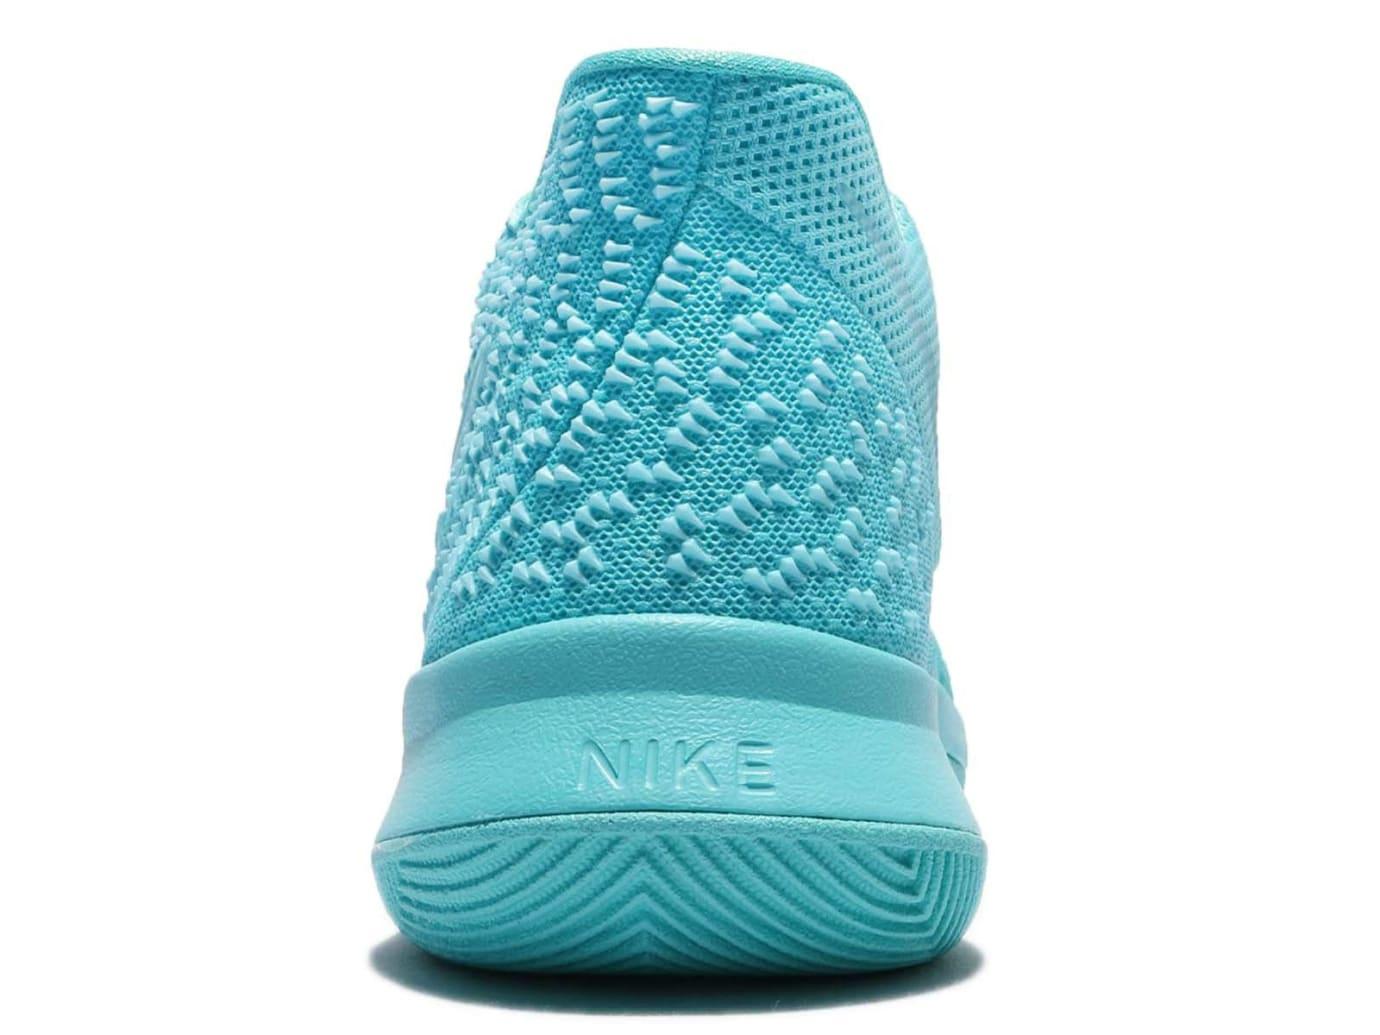 Nike Kyrie 3 GS Aqua Release Date Heel 859466-401